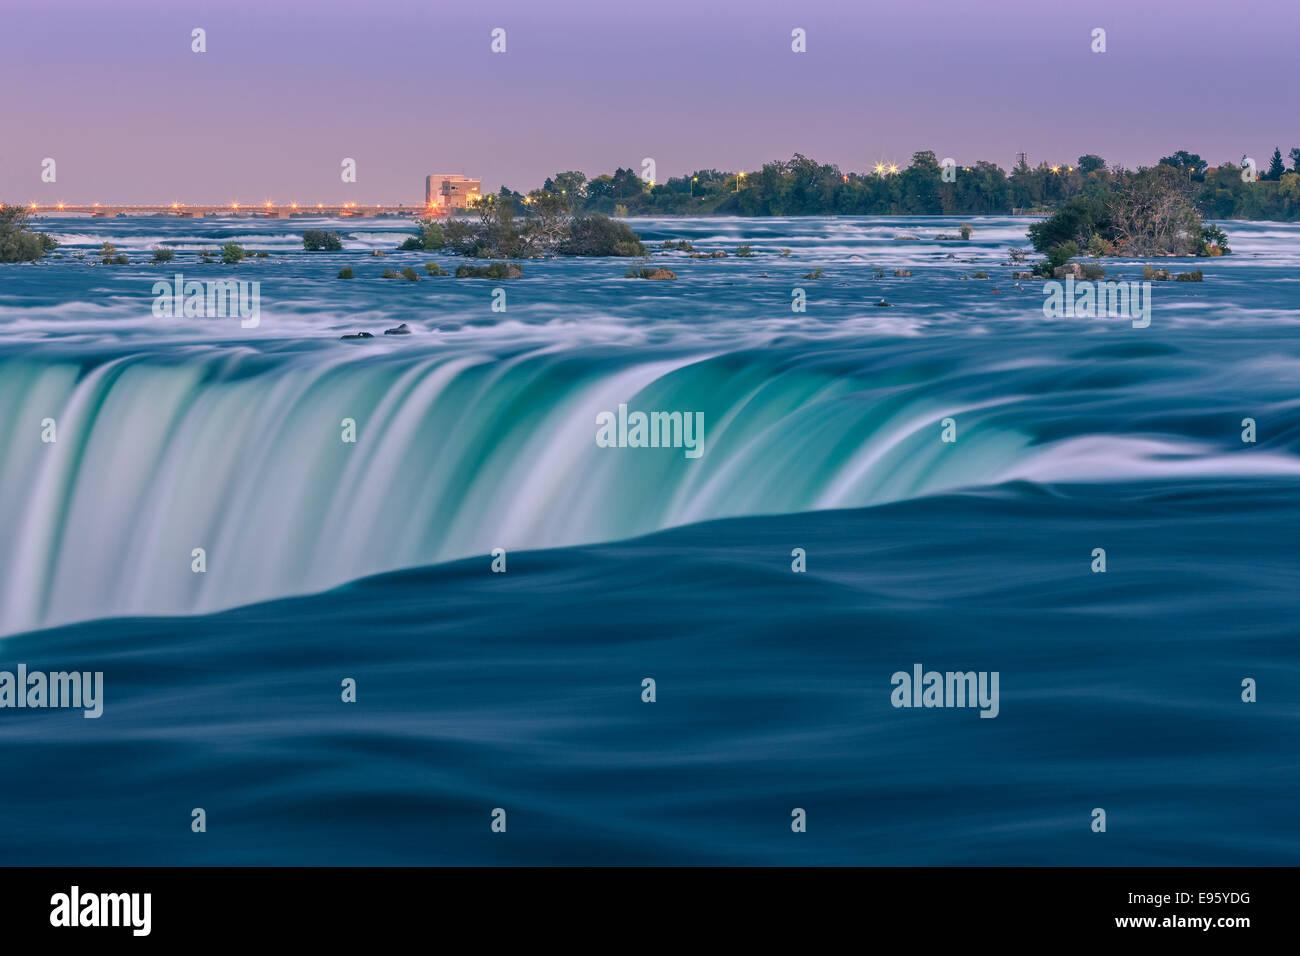 Cascate Horseshoe, parte del Niagara Falls, Ontario, Canada. Immagini Stock